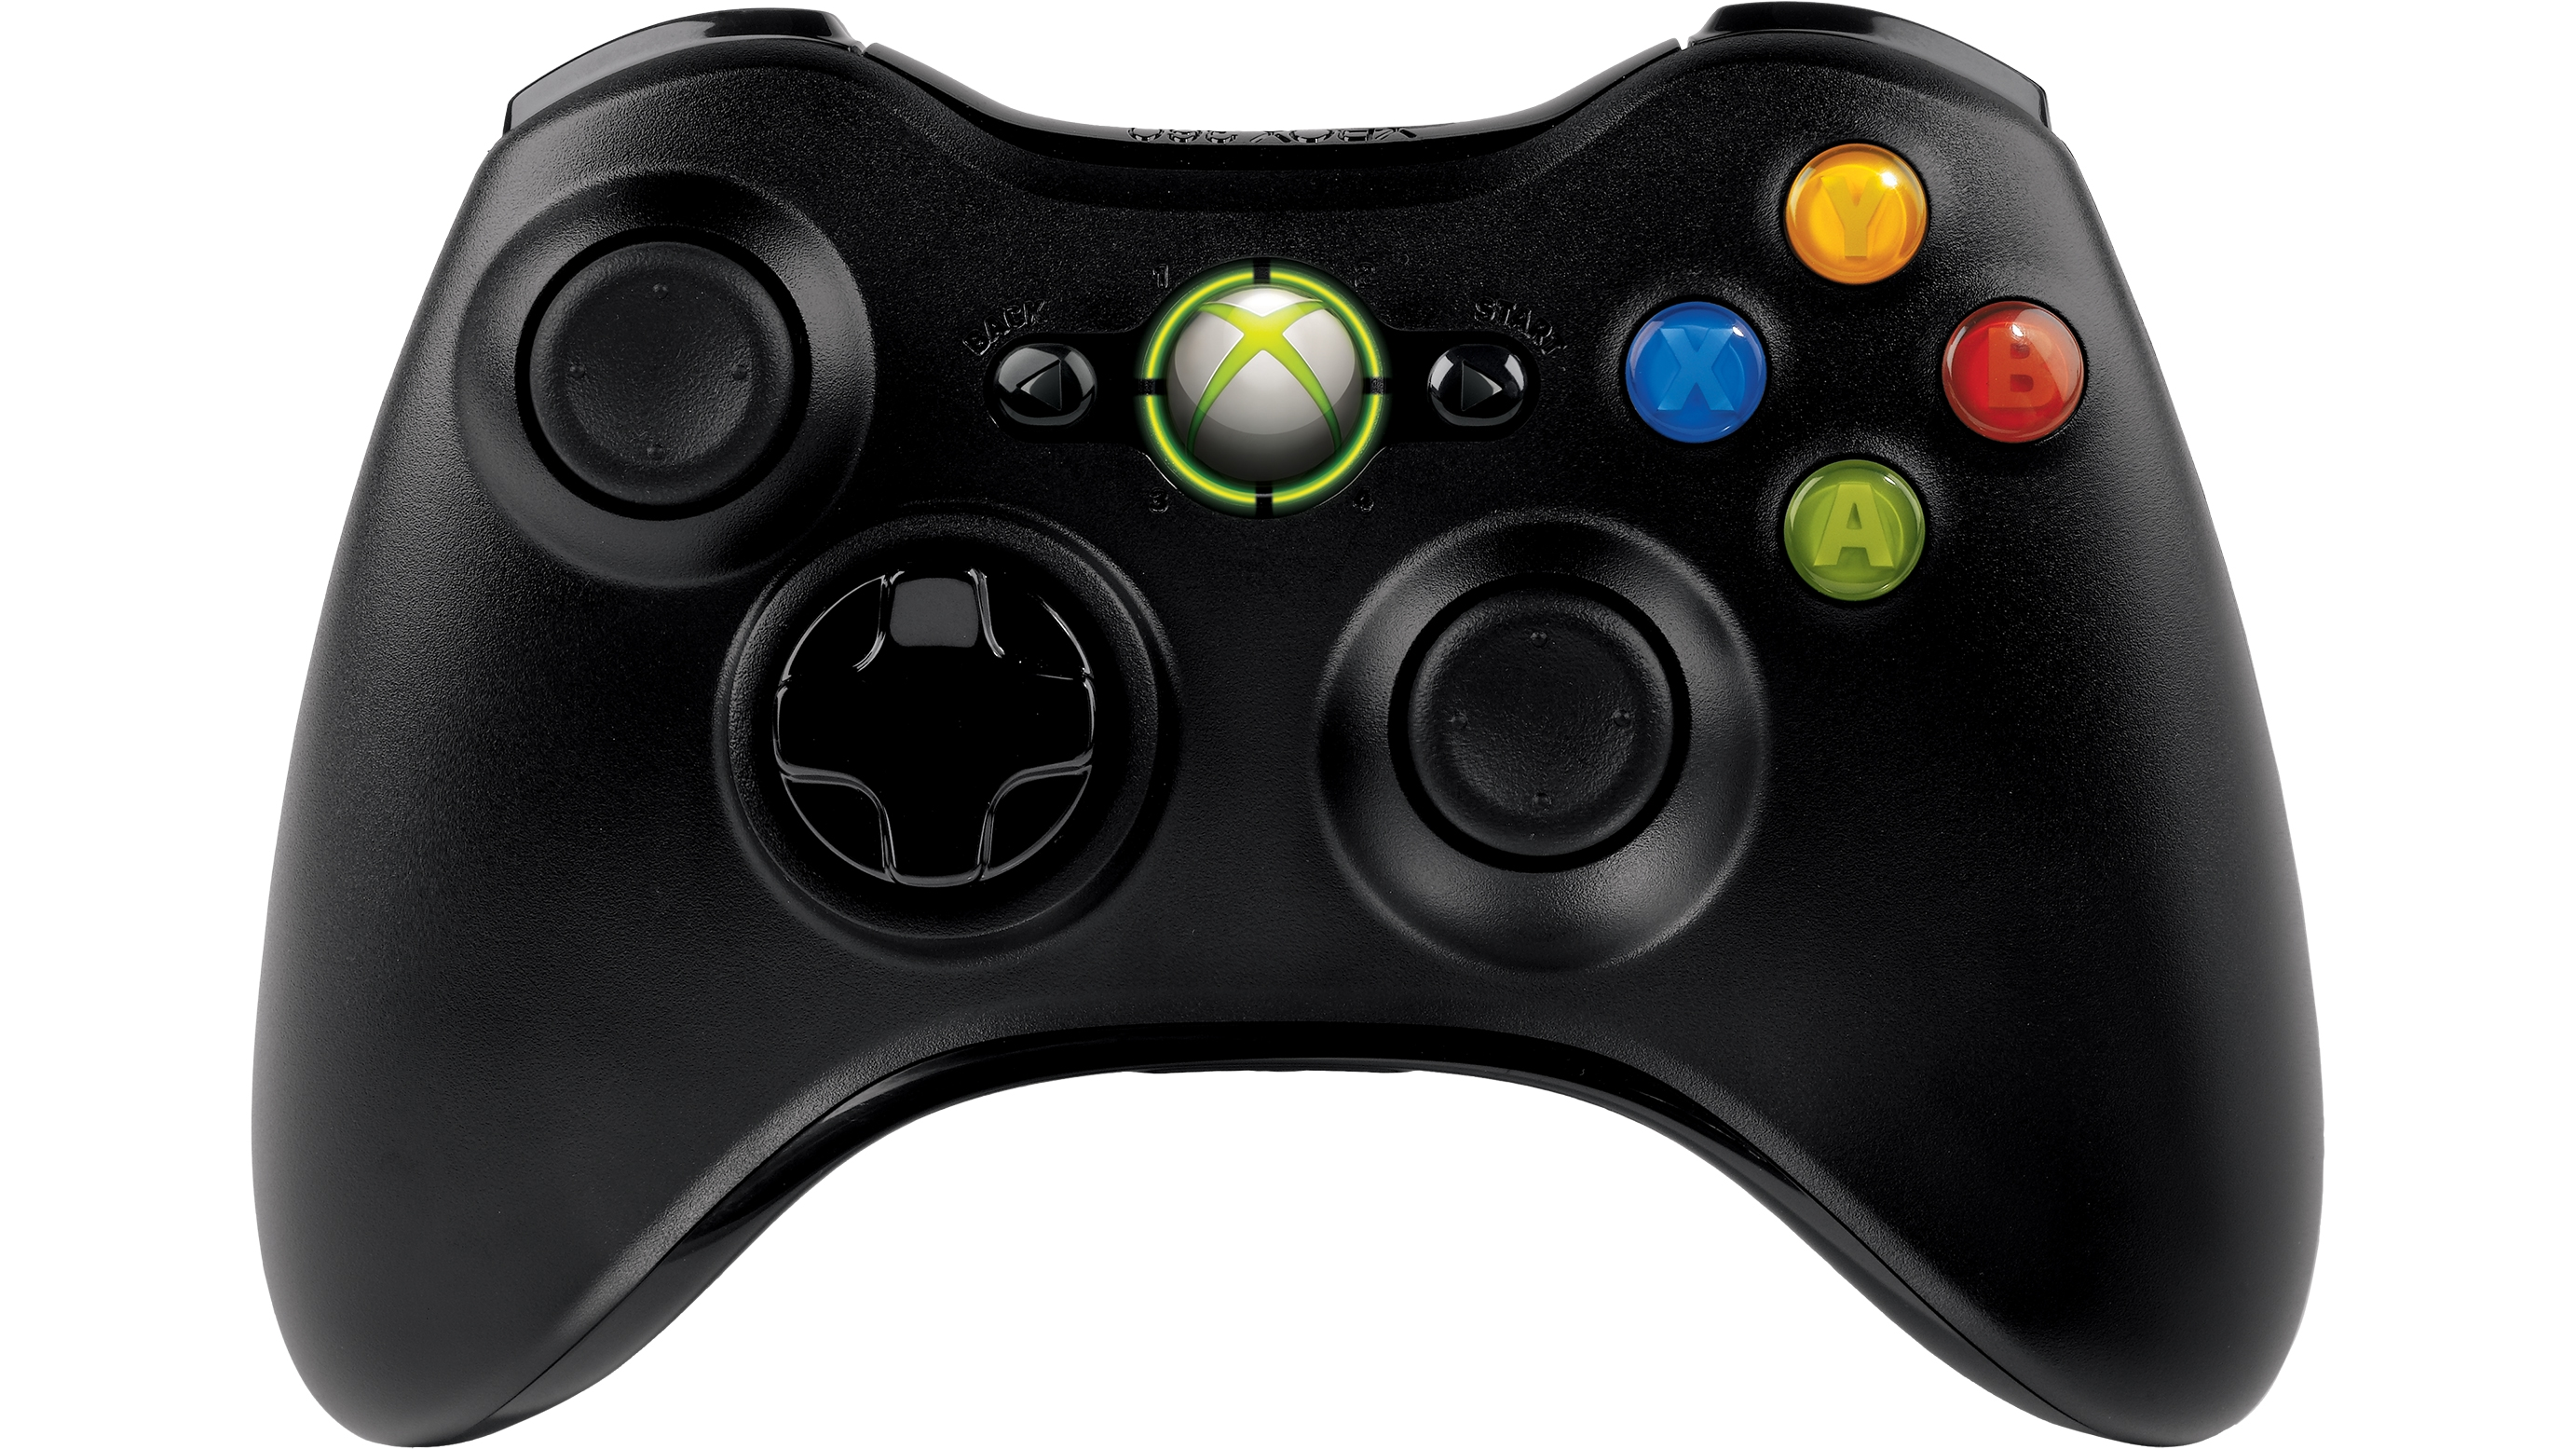 Xbox 360 Wireless Controller (Black)